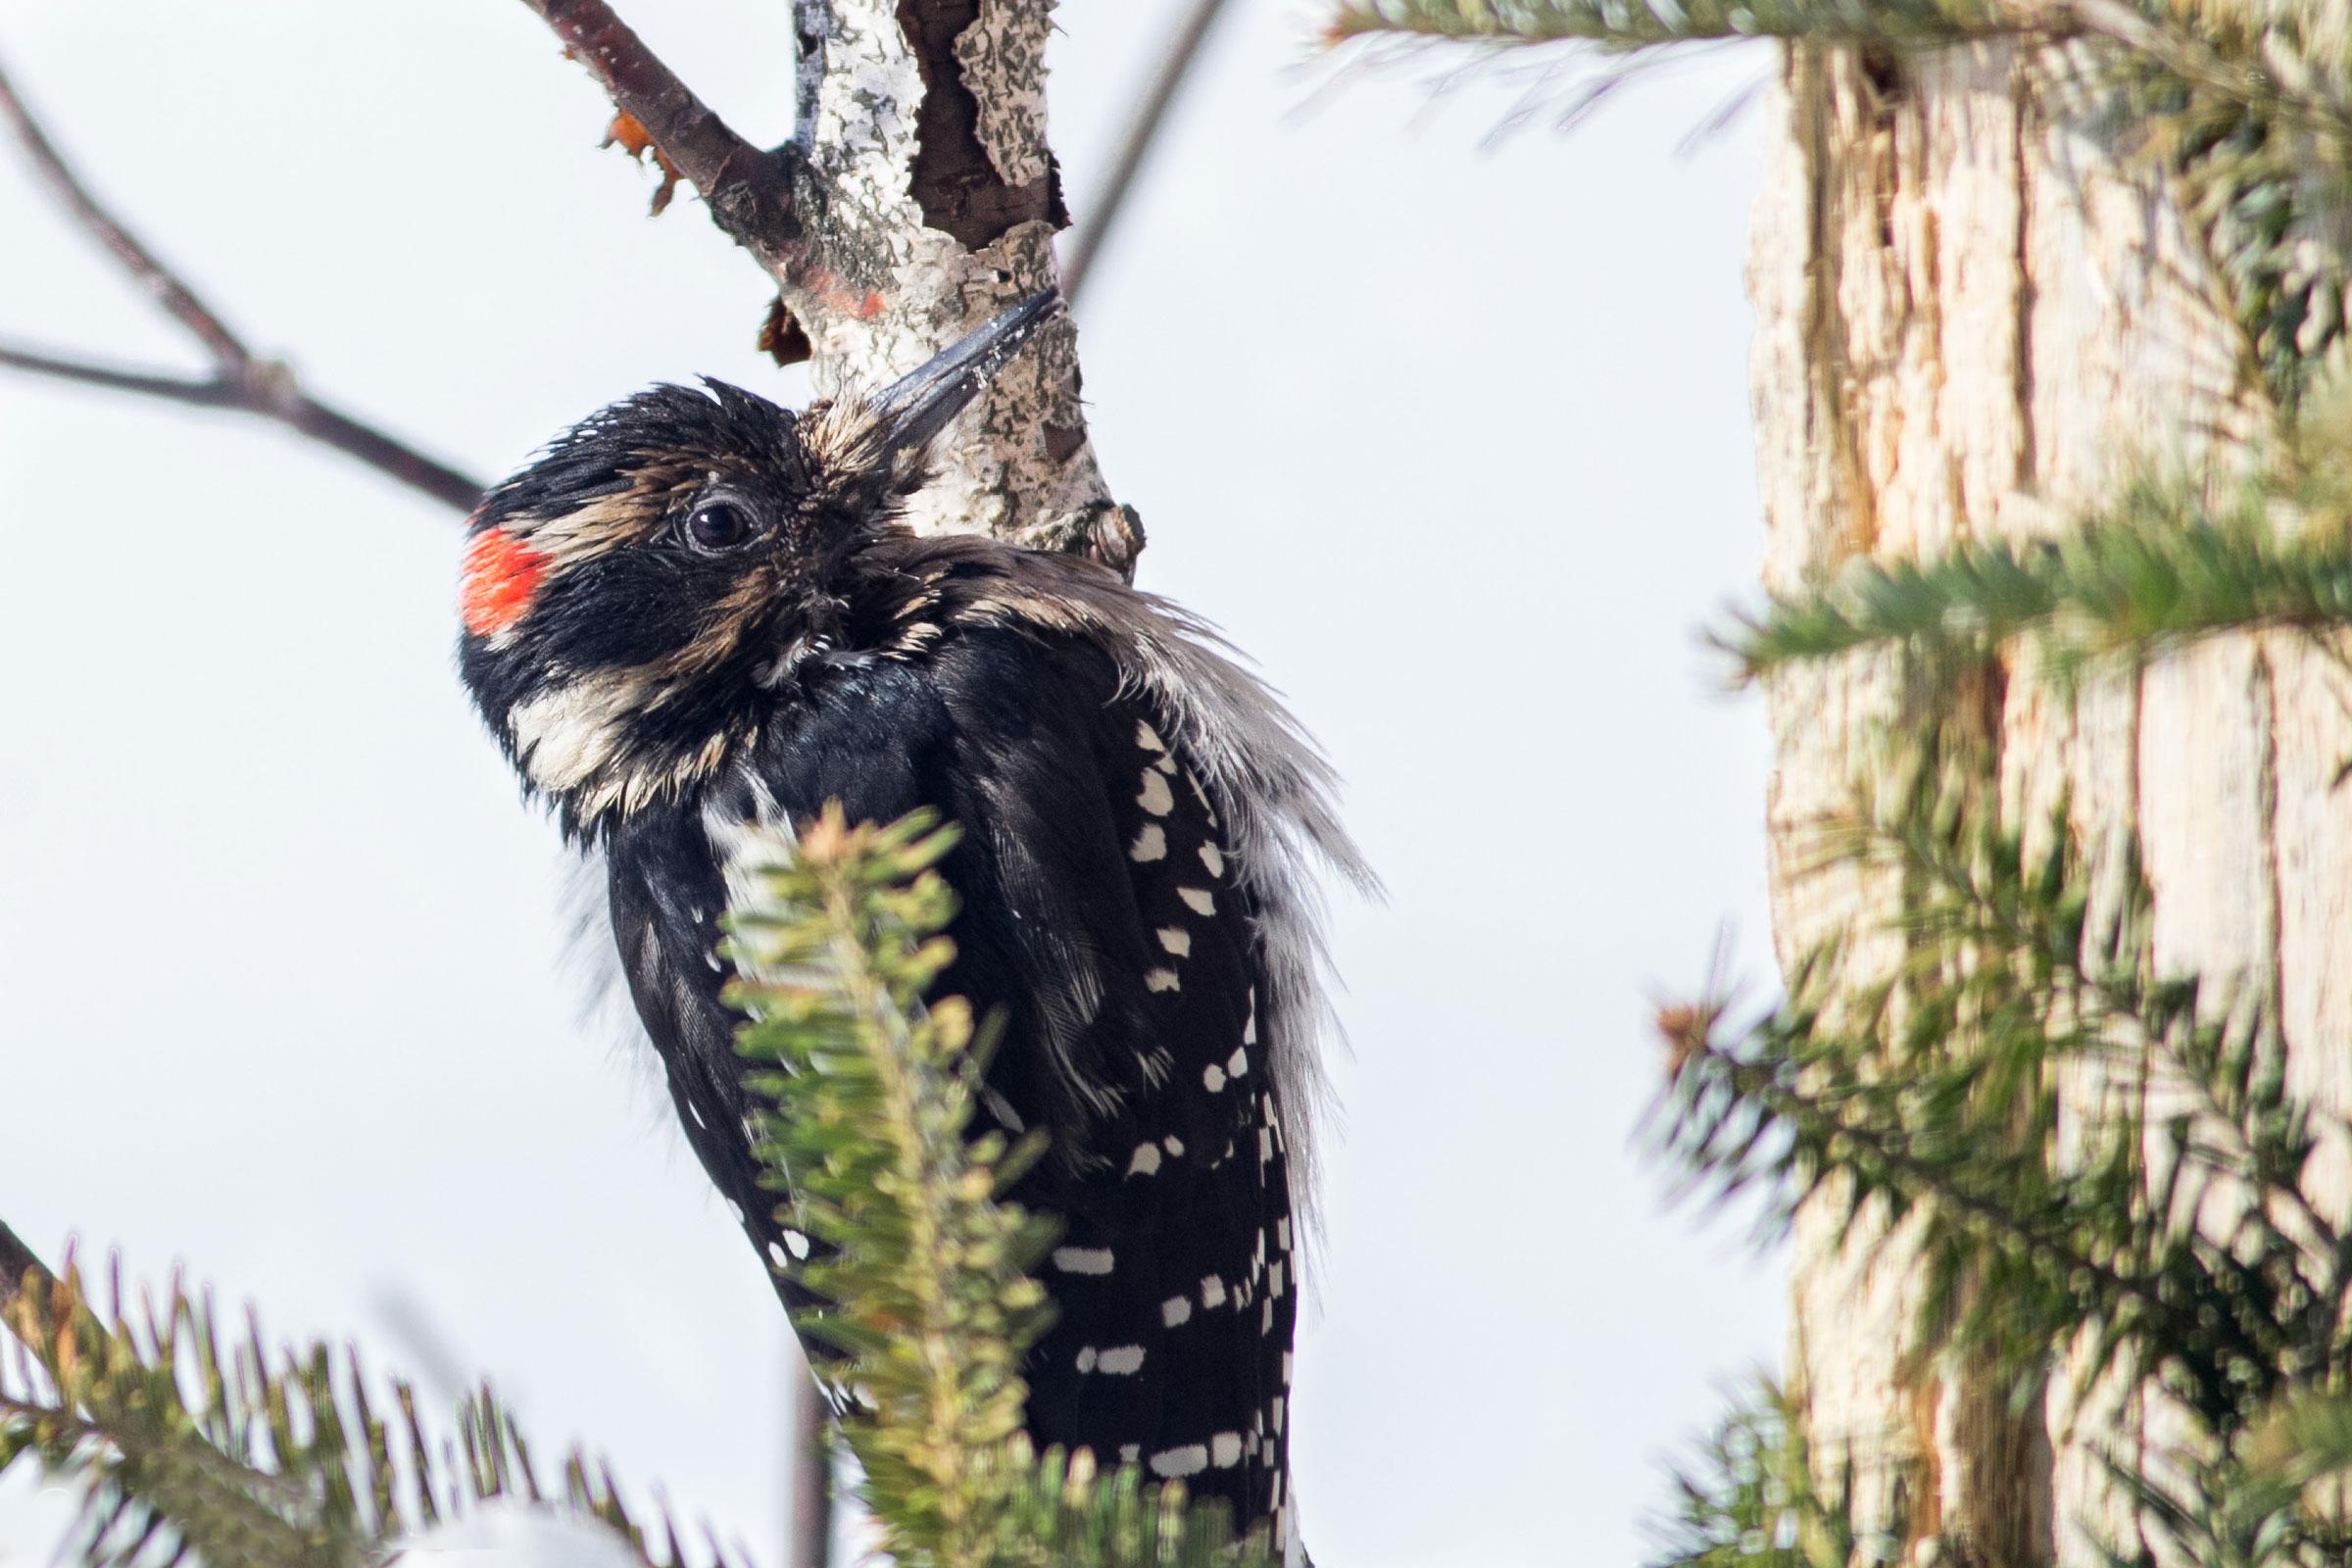 Hairy Woodpecker. Sandy Cutting/Audubon Photography Awards